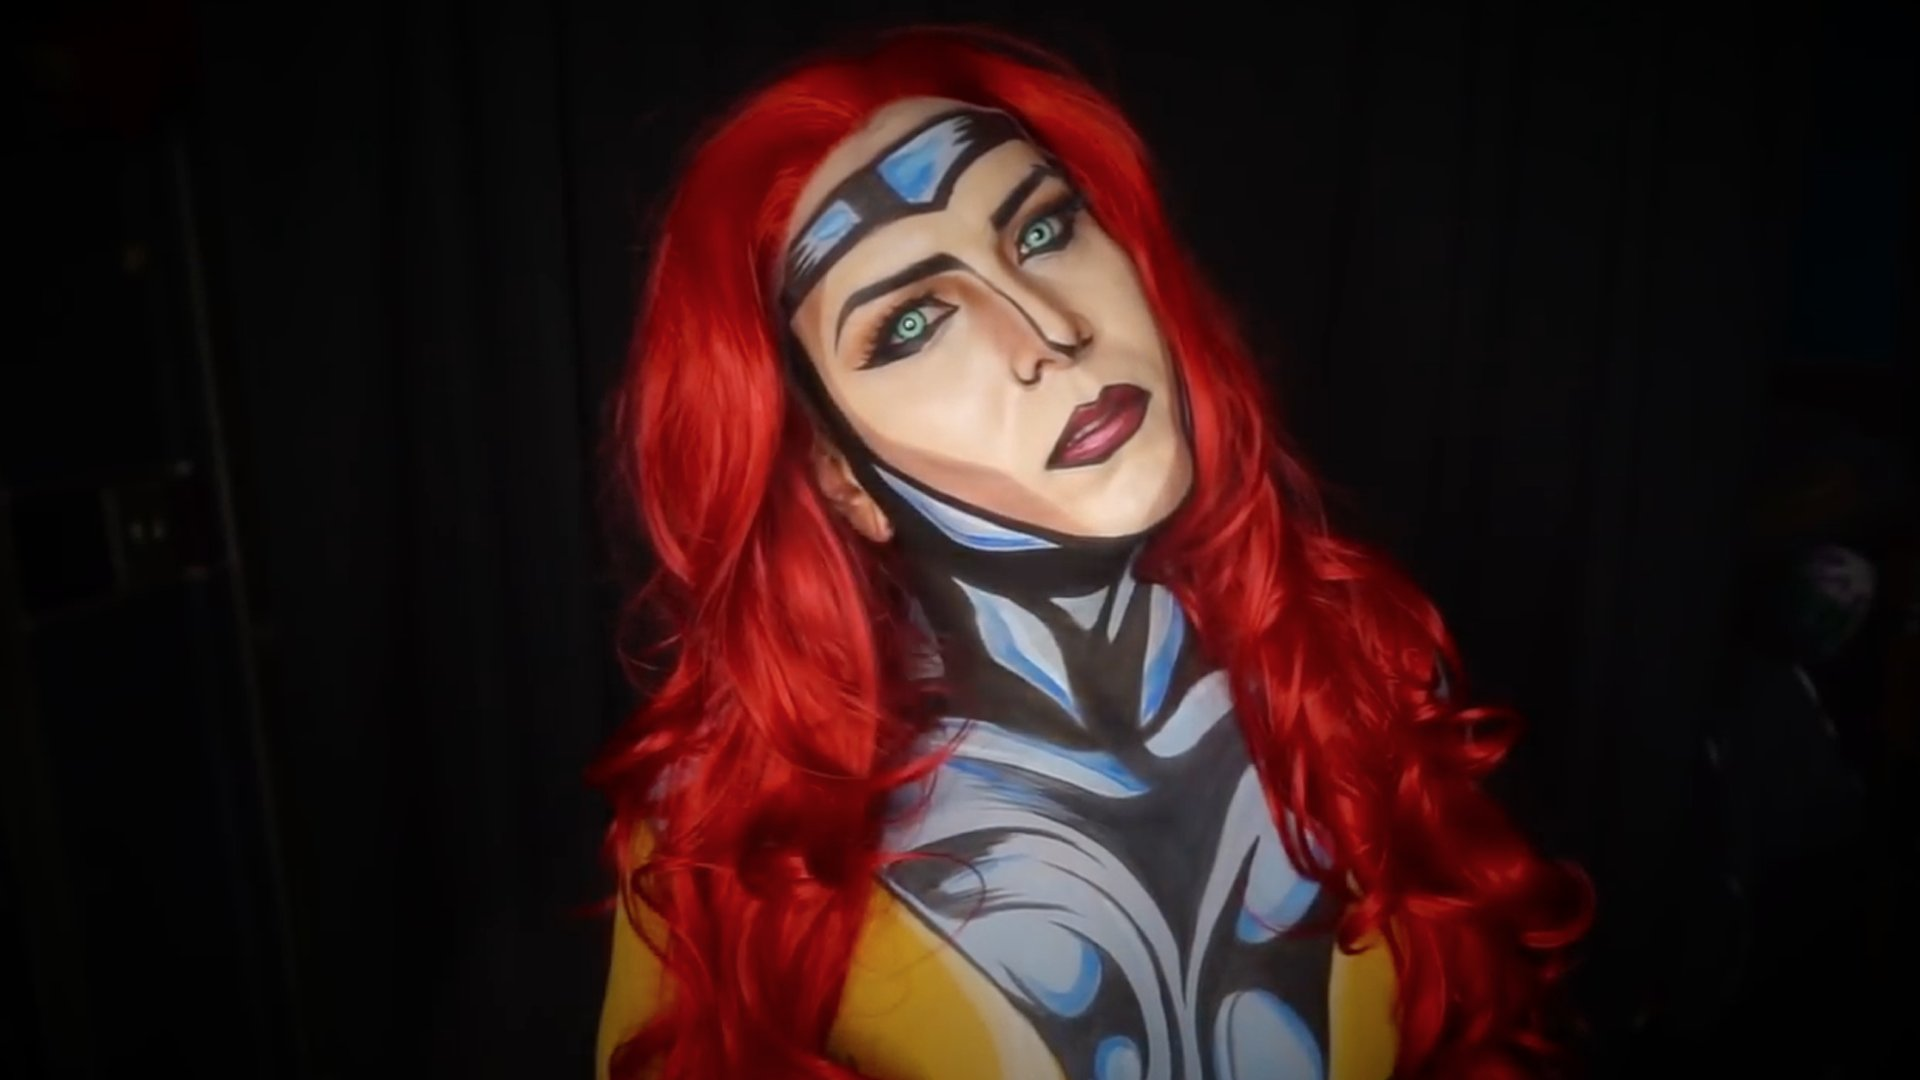 This makeup artist is known as the 'Comic King' 👑 https://t.co/i8qGJoKmQj